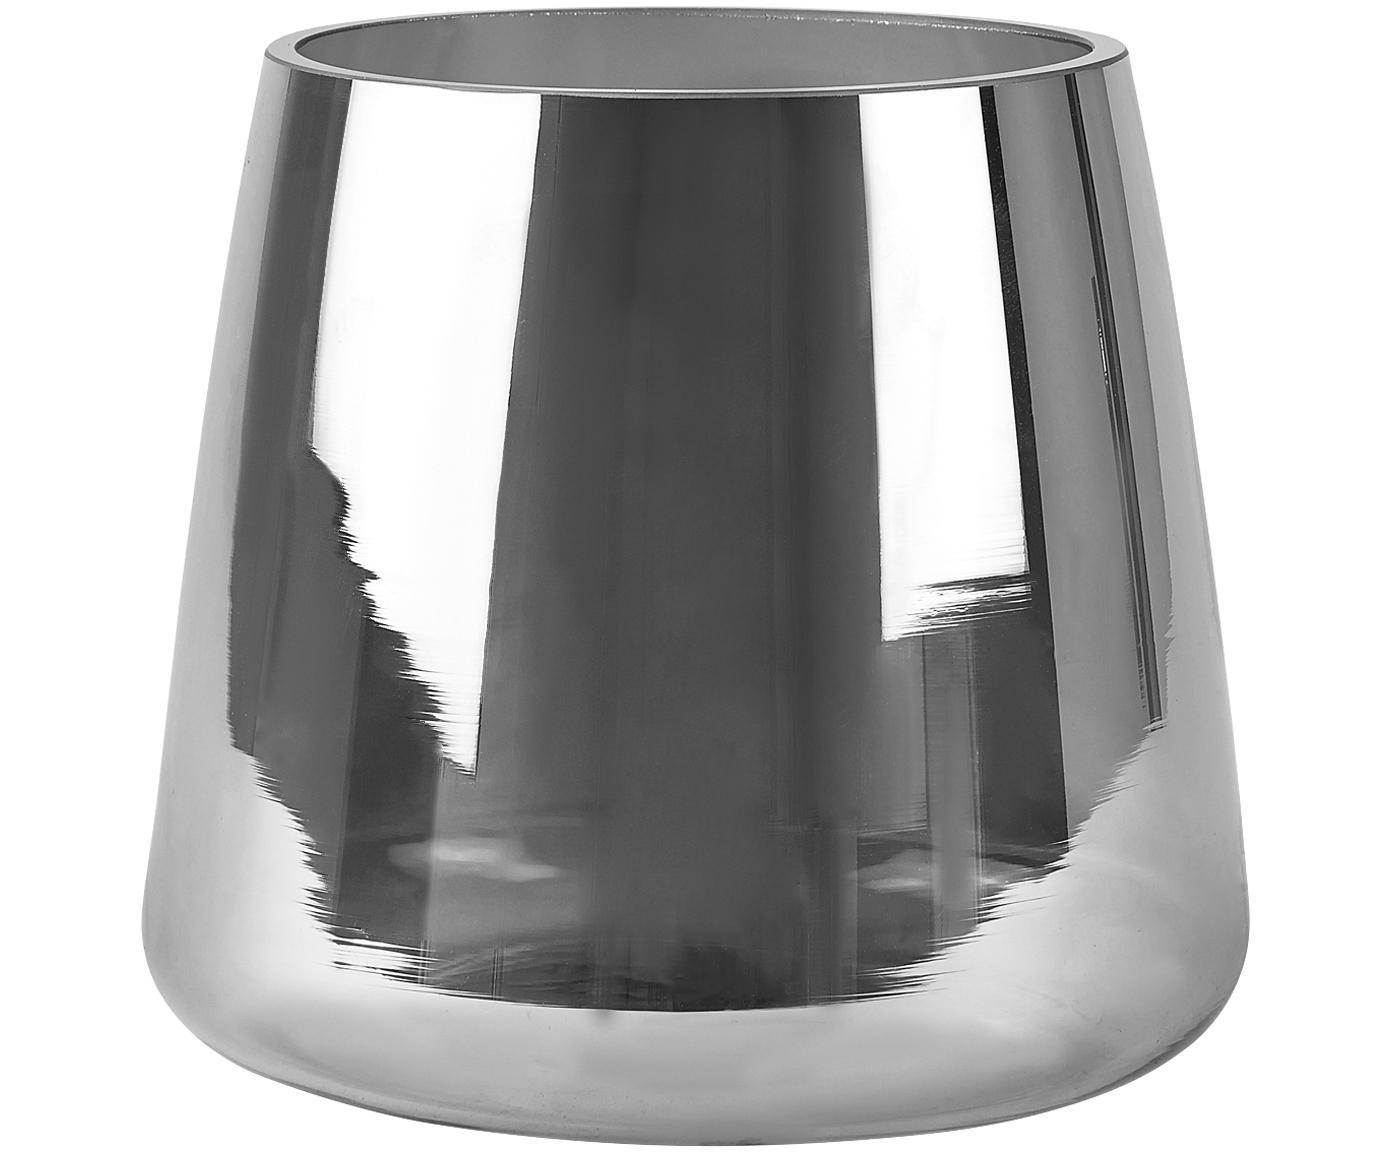 Glas-Vase Carina, Glas, Silberfarben, transparent, Ø 18 x H 16 cm